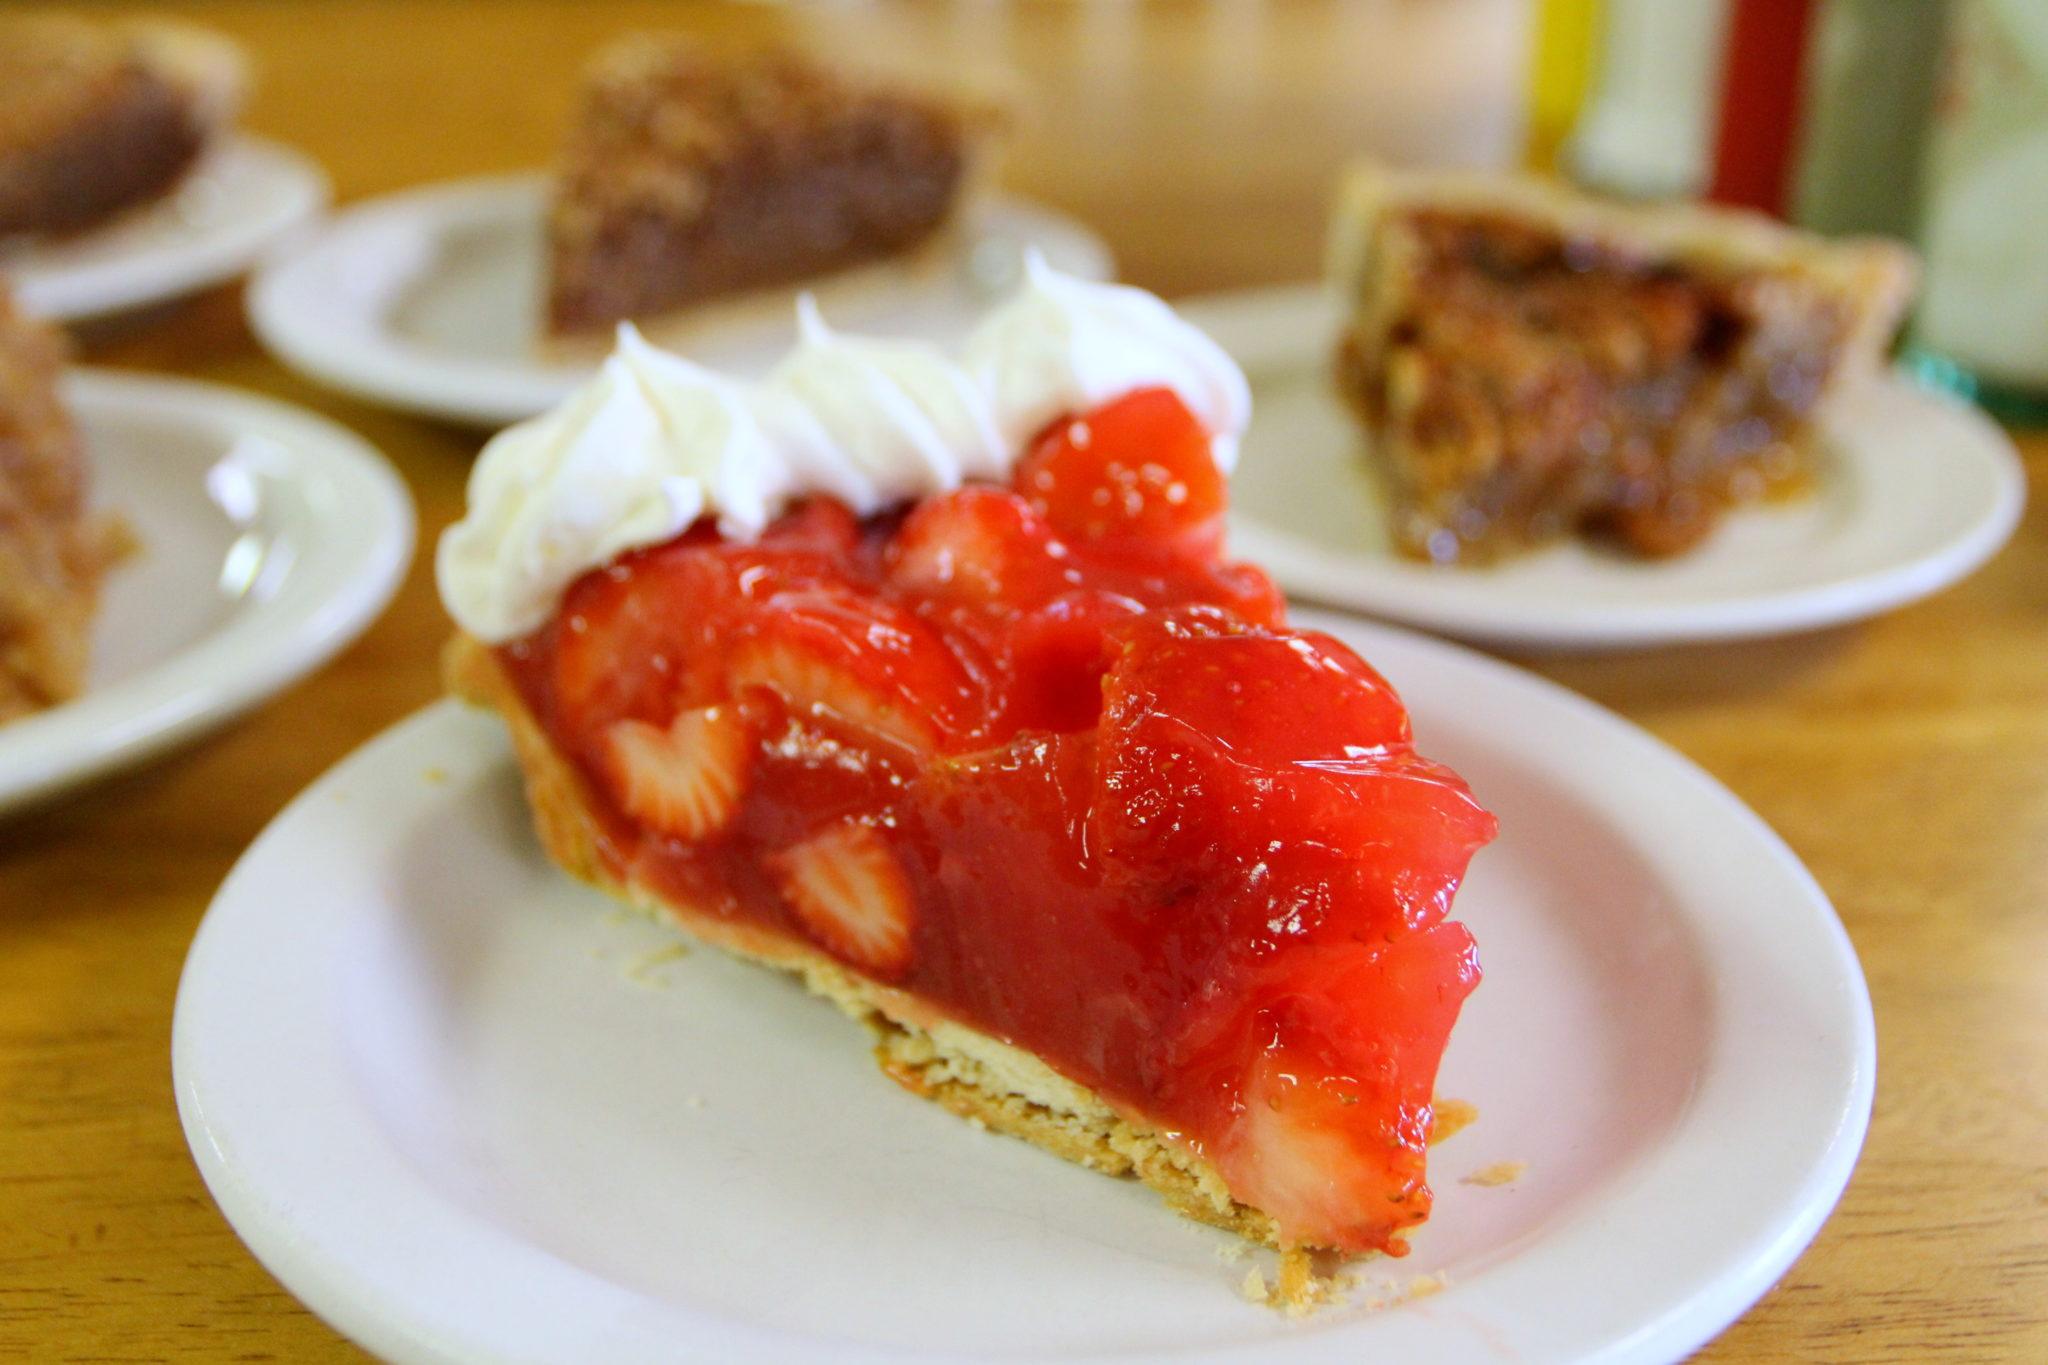 springdale-wagon-wheel-country-cafe-strawberry-pie-by-kat-robinson.jpg